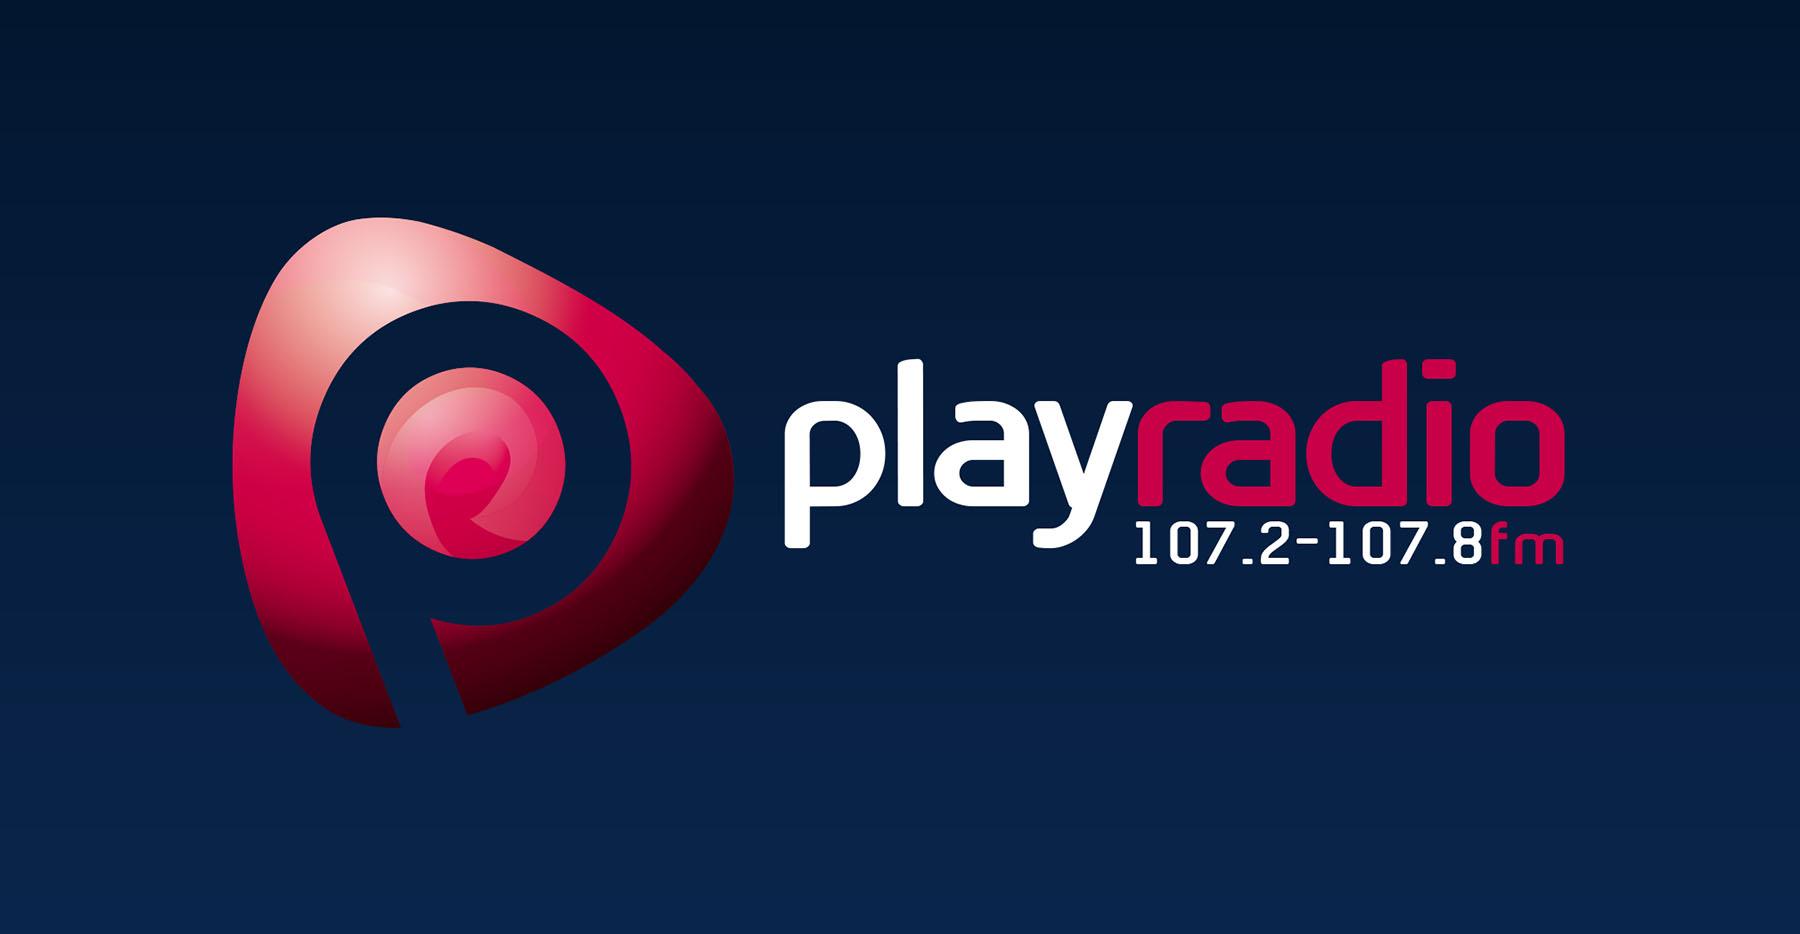 play radio logo design